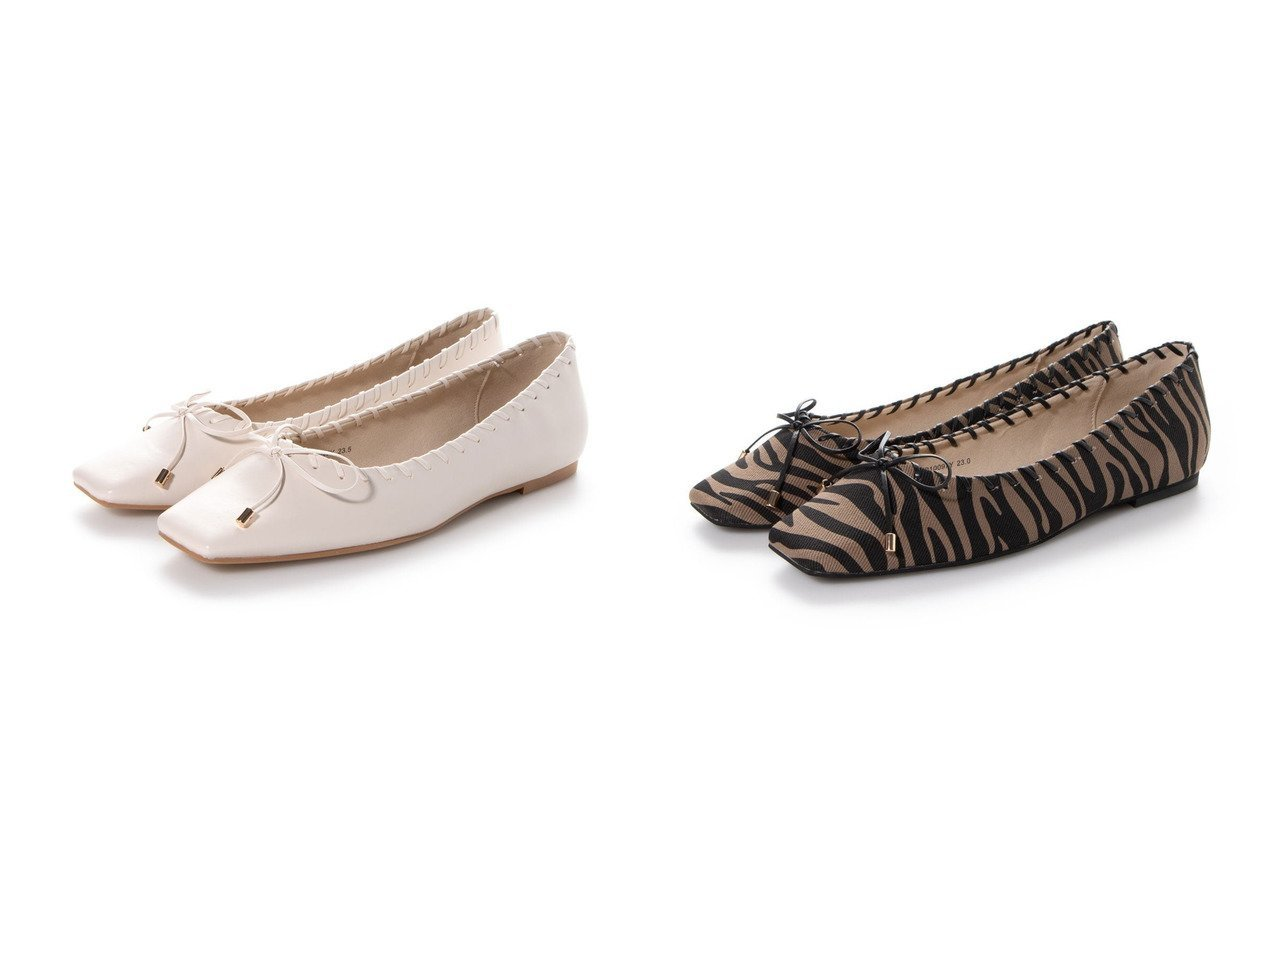 【RANDA/ランダ】のスクエアトゥリボン編みフラットパンプス シューズ・靴のおすすめ!人気、トレンド・レディースファッションの通販 おすすめで人気の流行・トレンド、ファッションの通販商品 メンズファッション・キッズファッション・インテリア・家具・レディースファッション・服の通販 founy(ファニー) https://founy.com/ ファッション Fashion レディースファッション WOMEN 2021年 2021 2021 春夏 S/S SS Spring/Summer 2021 S/S 春夏 SS Spring/Summer トレンド フラット ライニング リボン 今季 春 Spring  ID:crp329100000023927